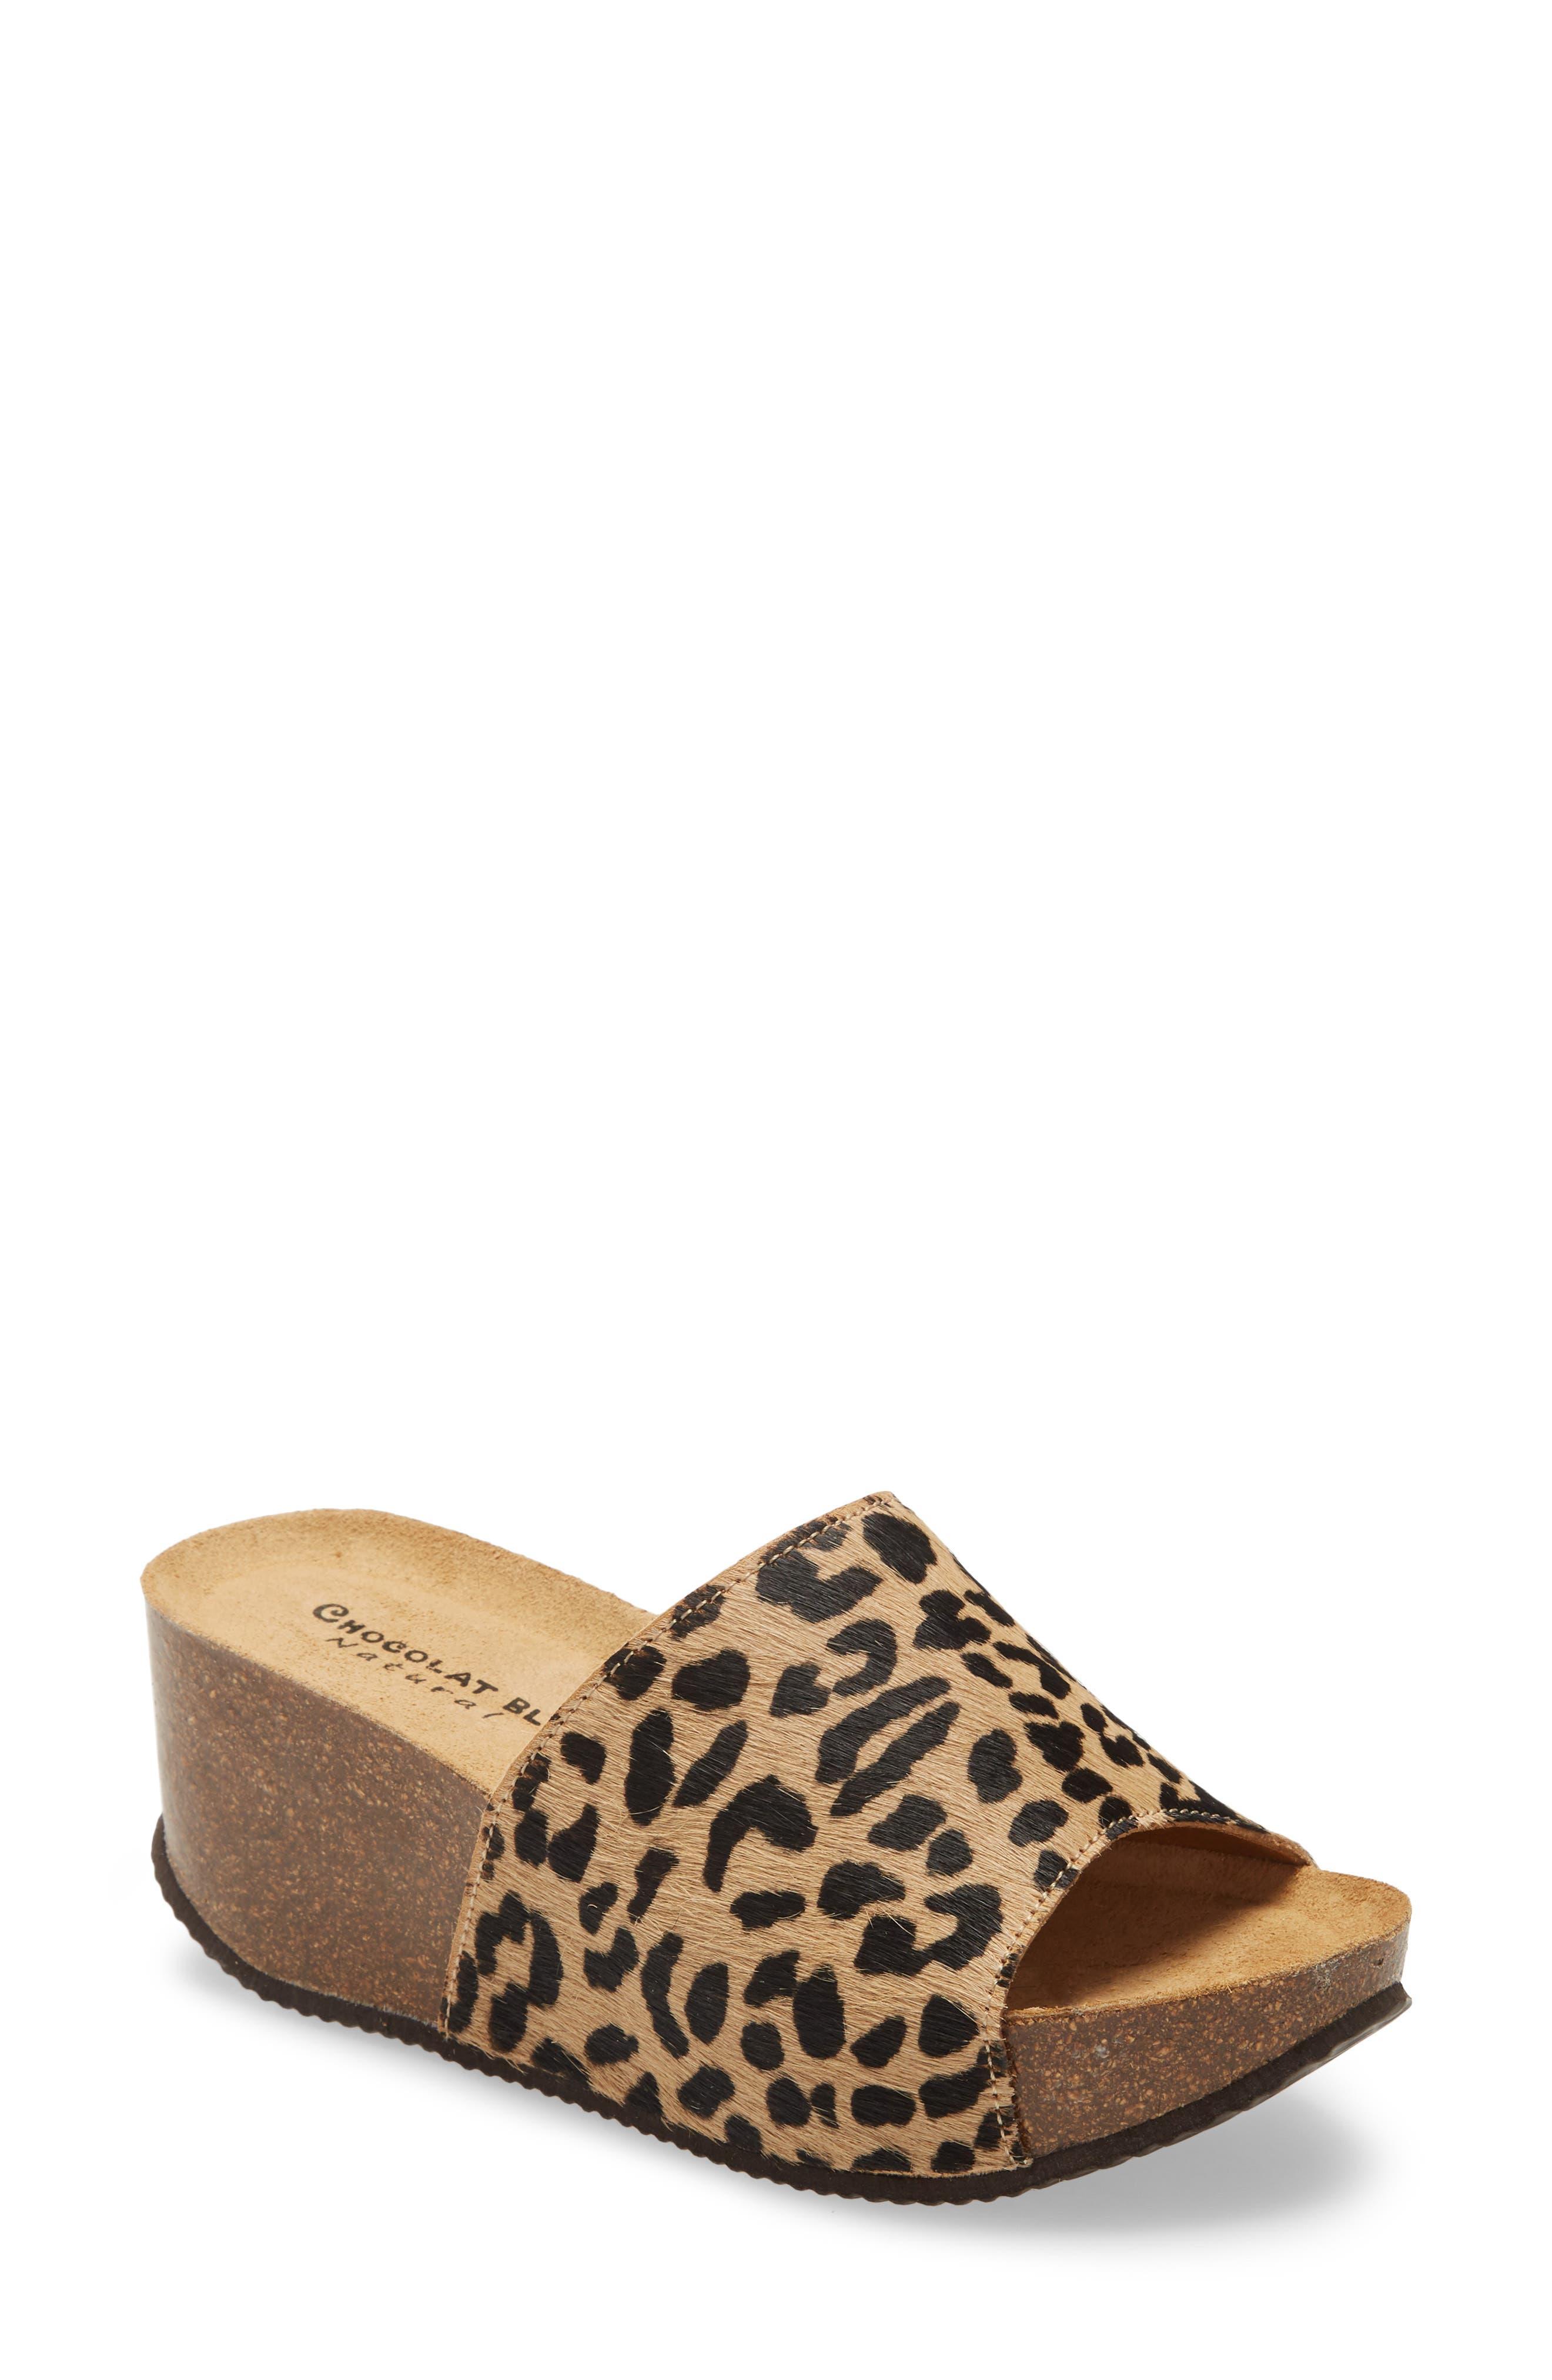 Abella Leopard Print Genuine Calf Hair Mule